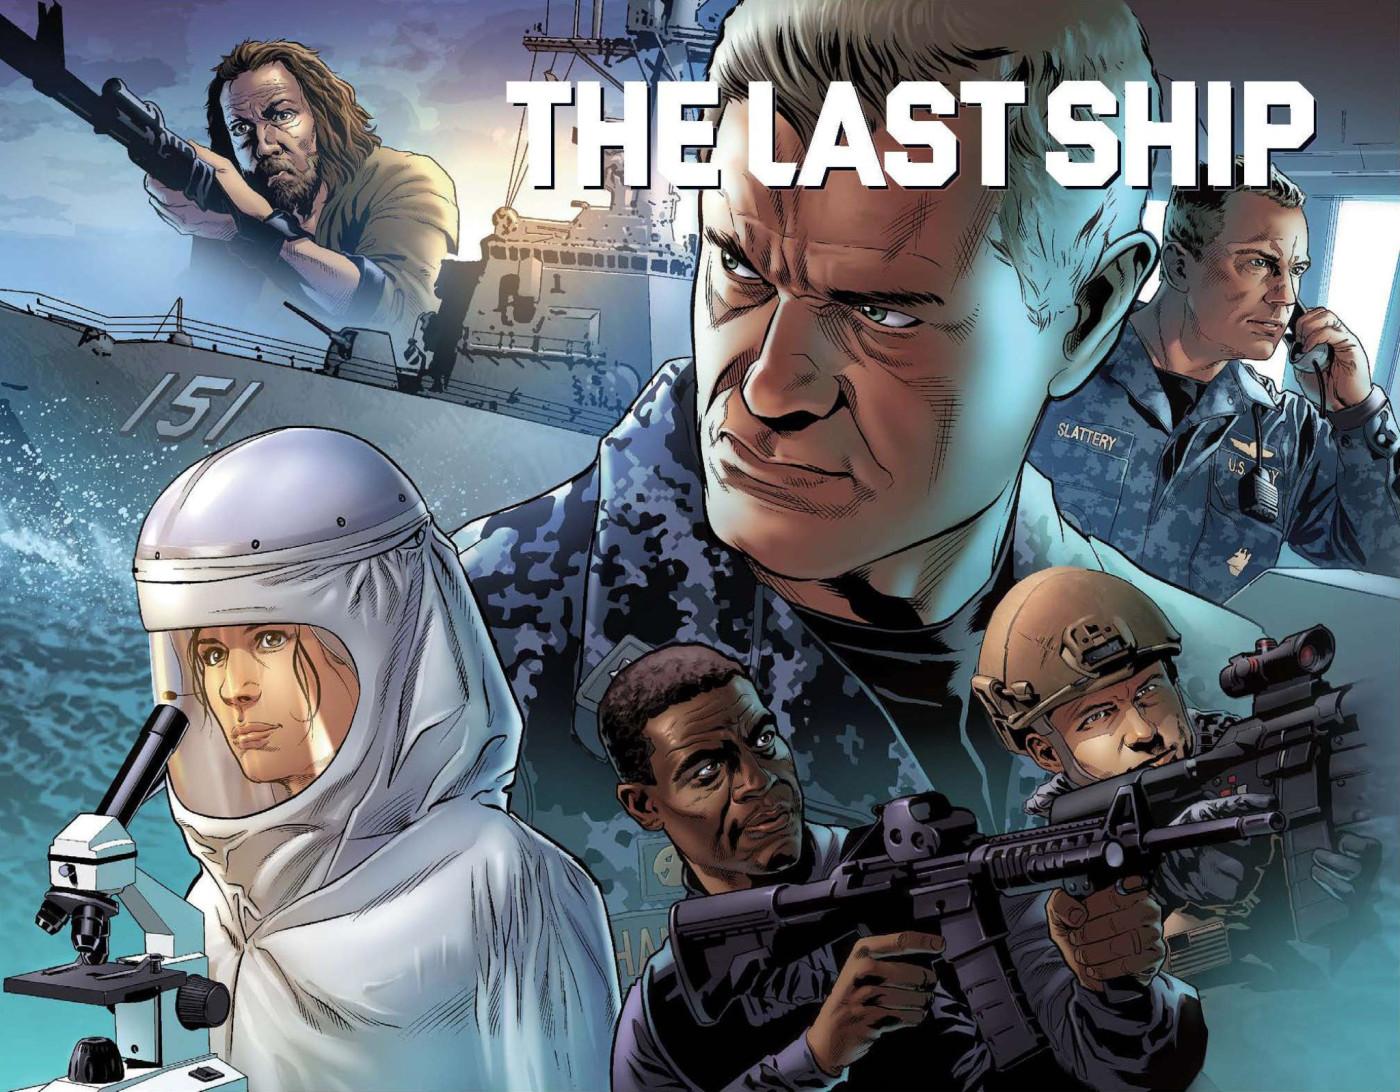 The Last Ship Netflix